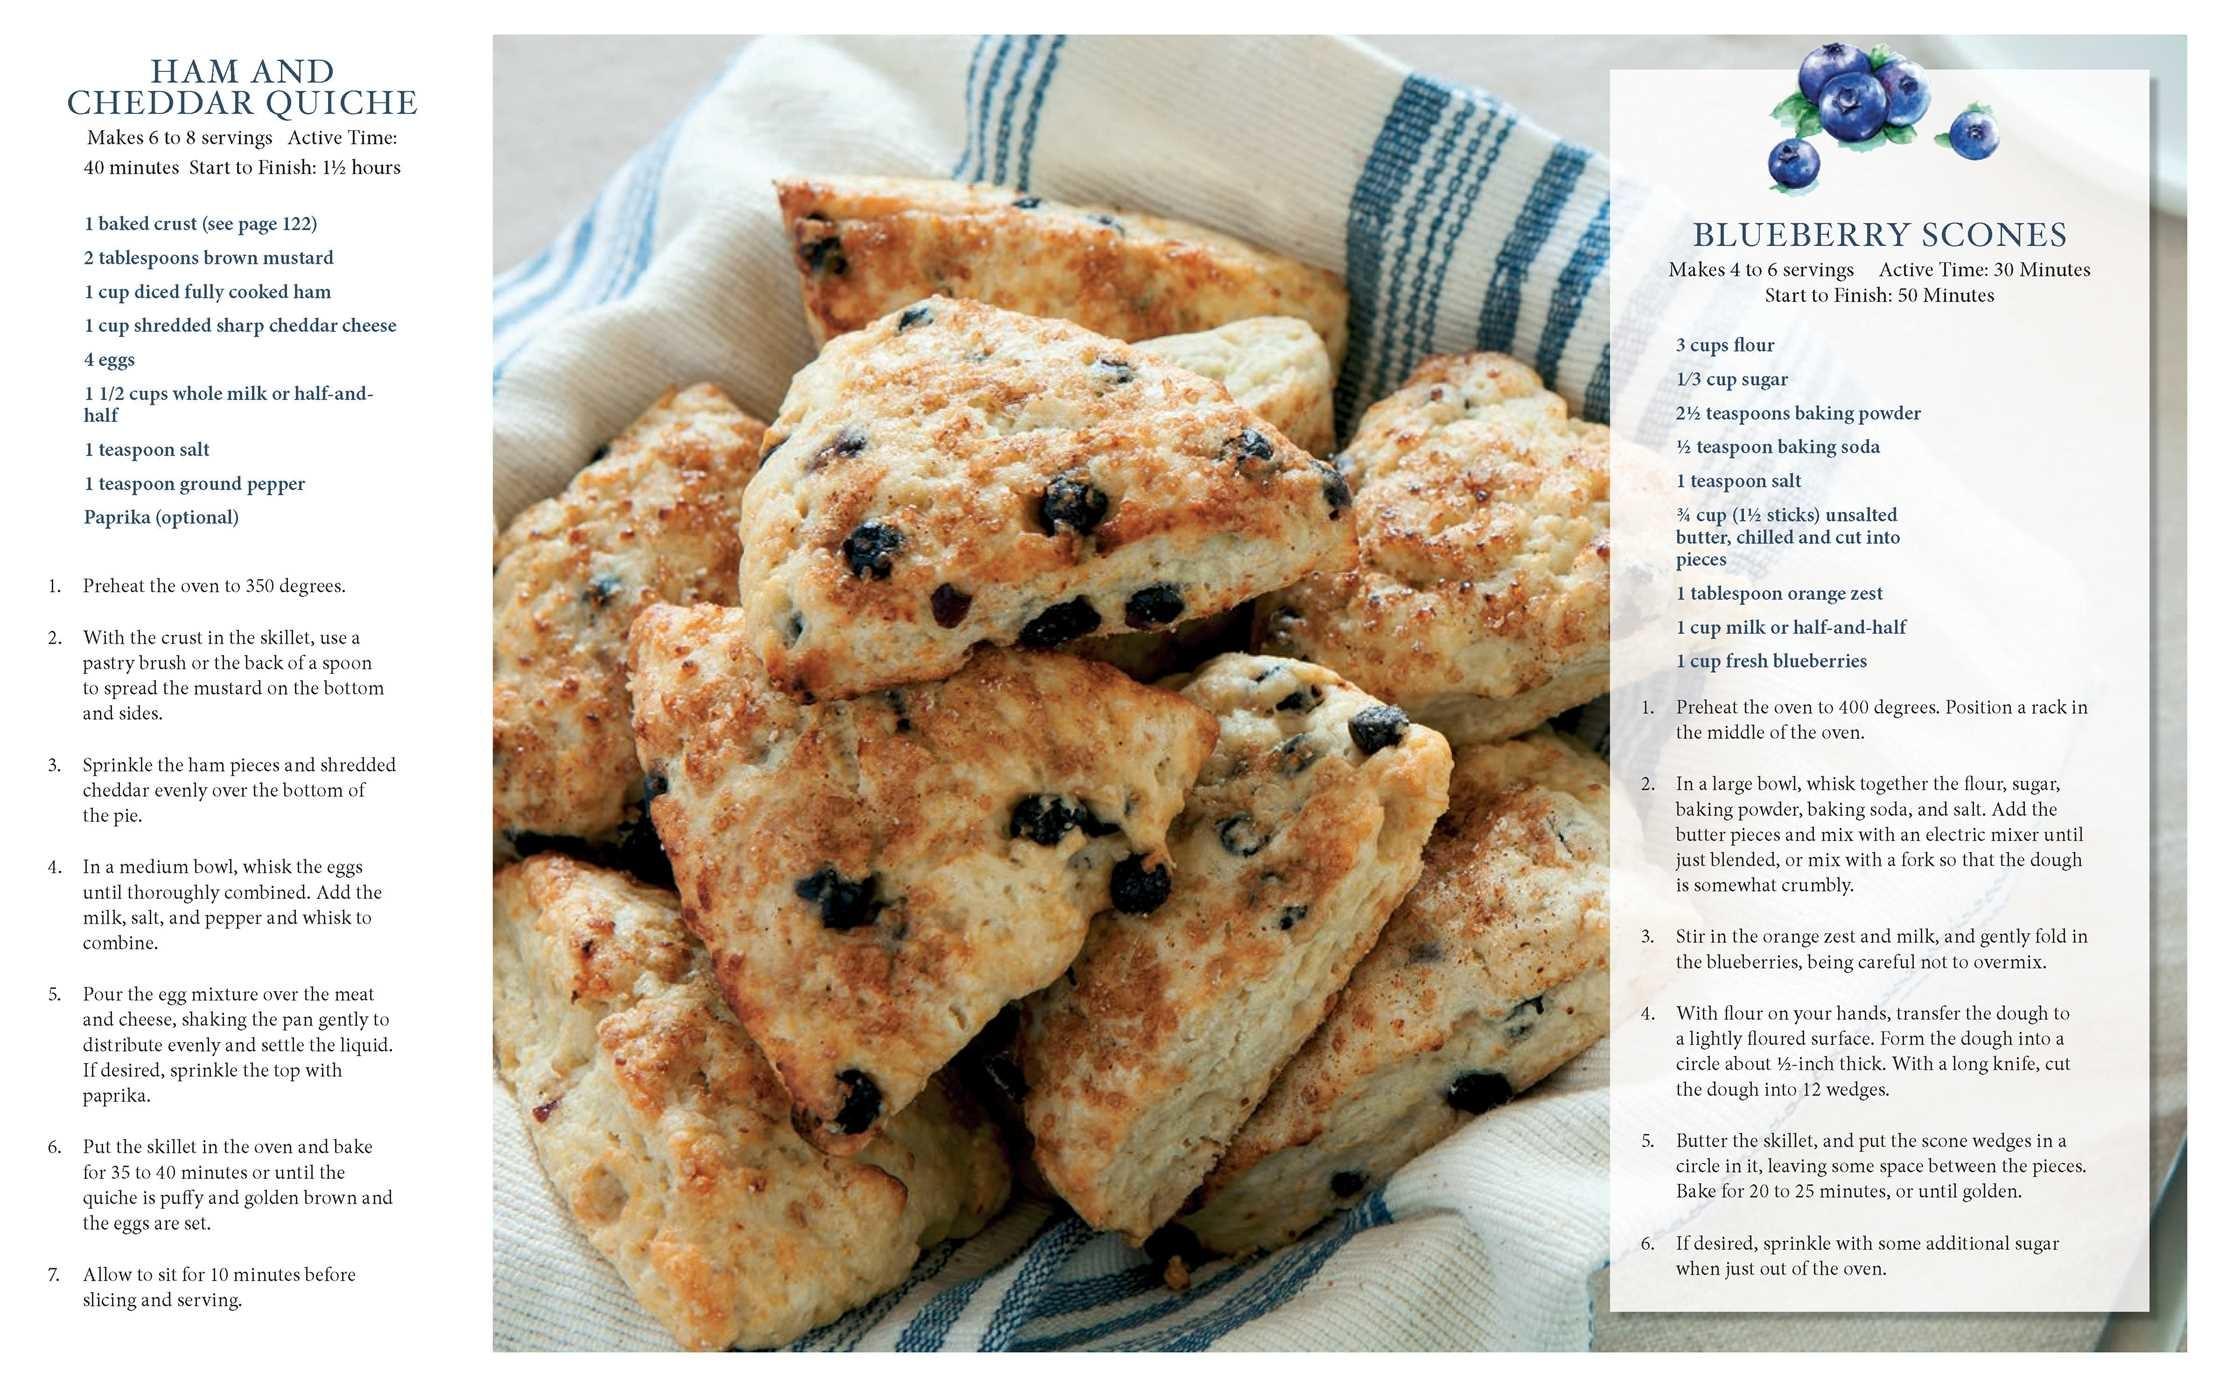 The sunday dinner cookbook 9781604337525.in02